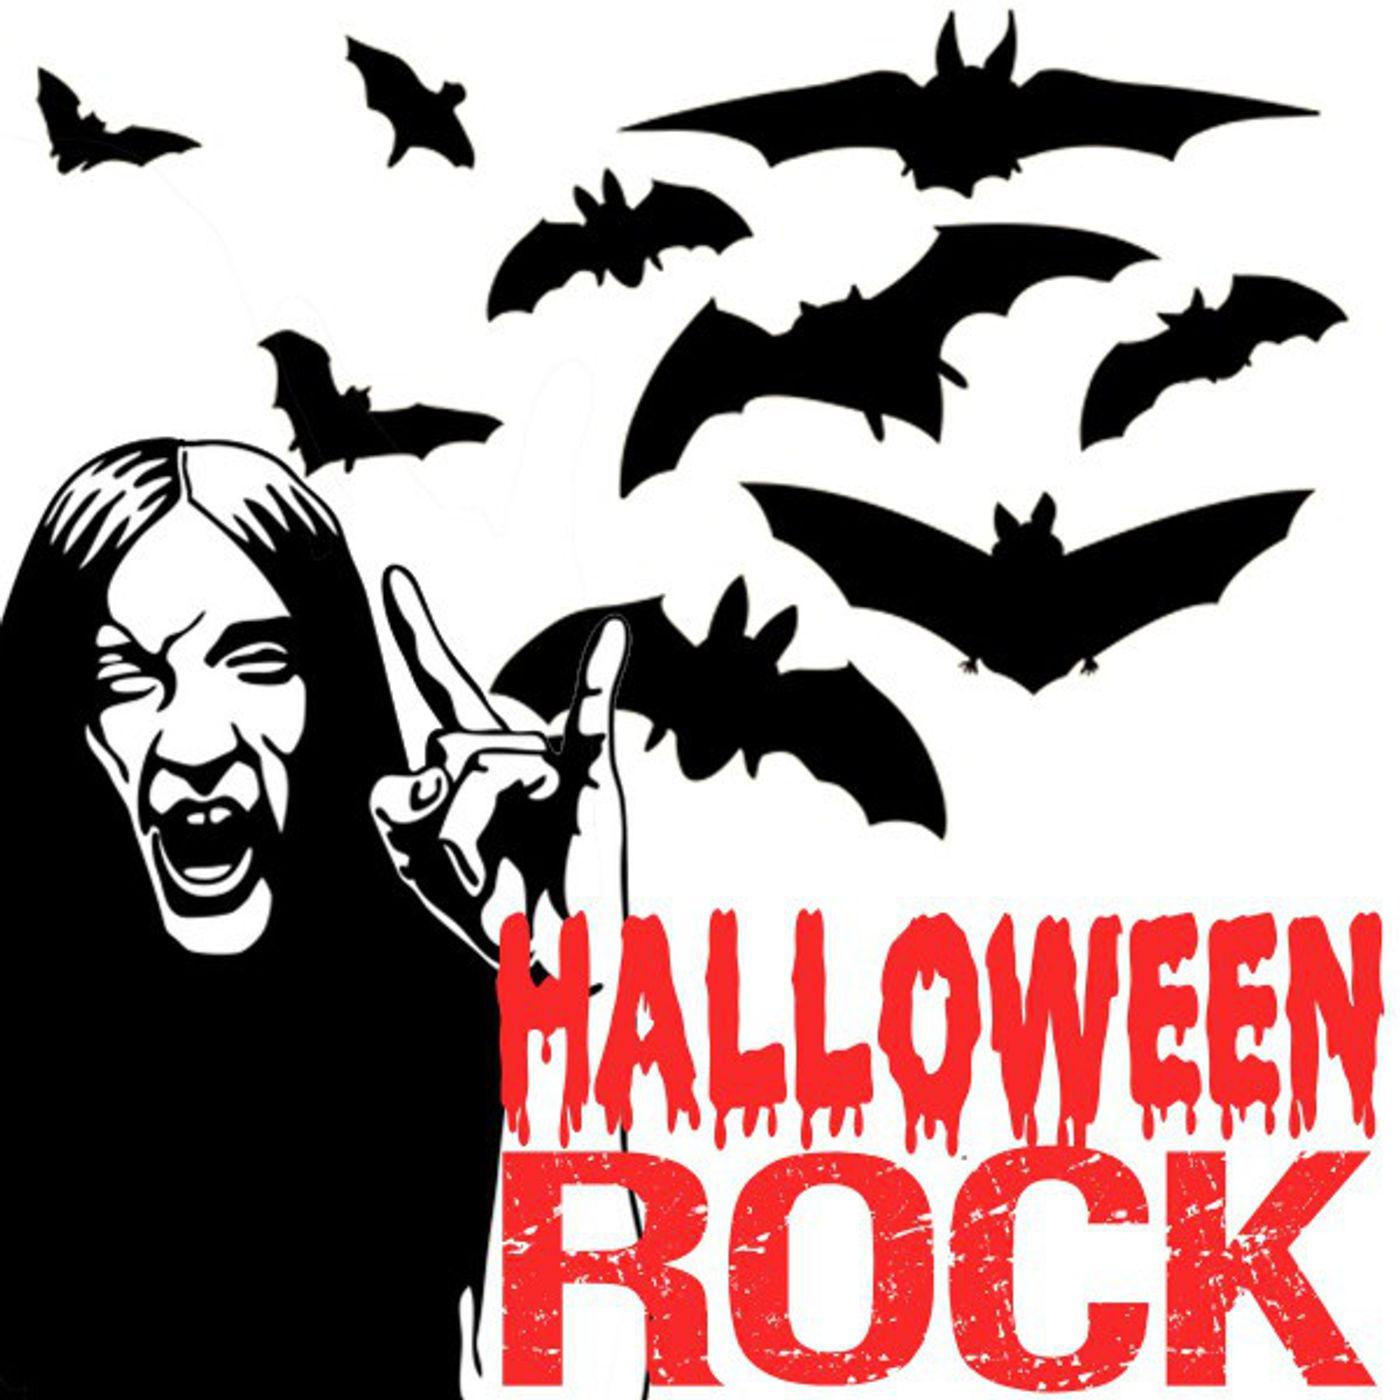 BEST OF CLASSIC ROCK LIVE #semanaHalloween #Halloween #avengers #shadowsfx #venom2 #venom #shangchi #whatif #eternals #scream